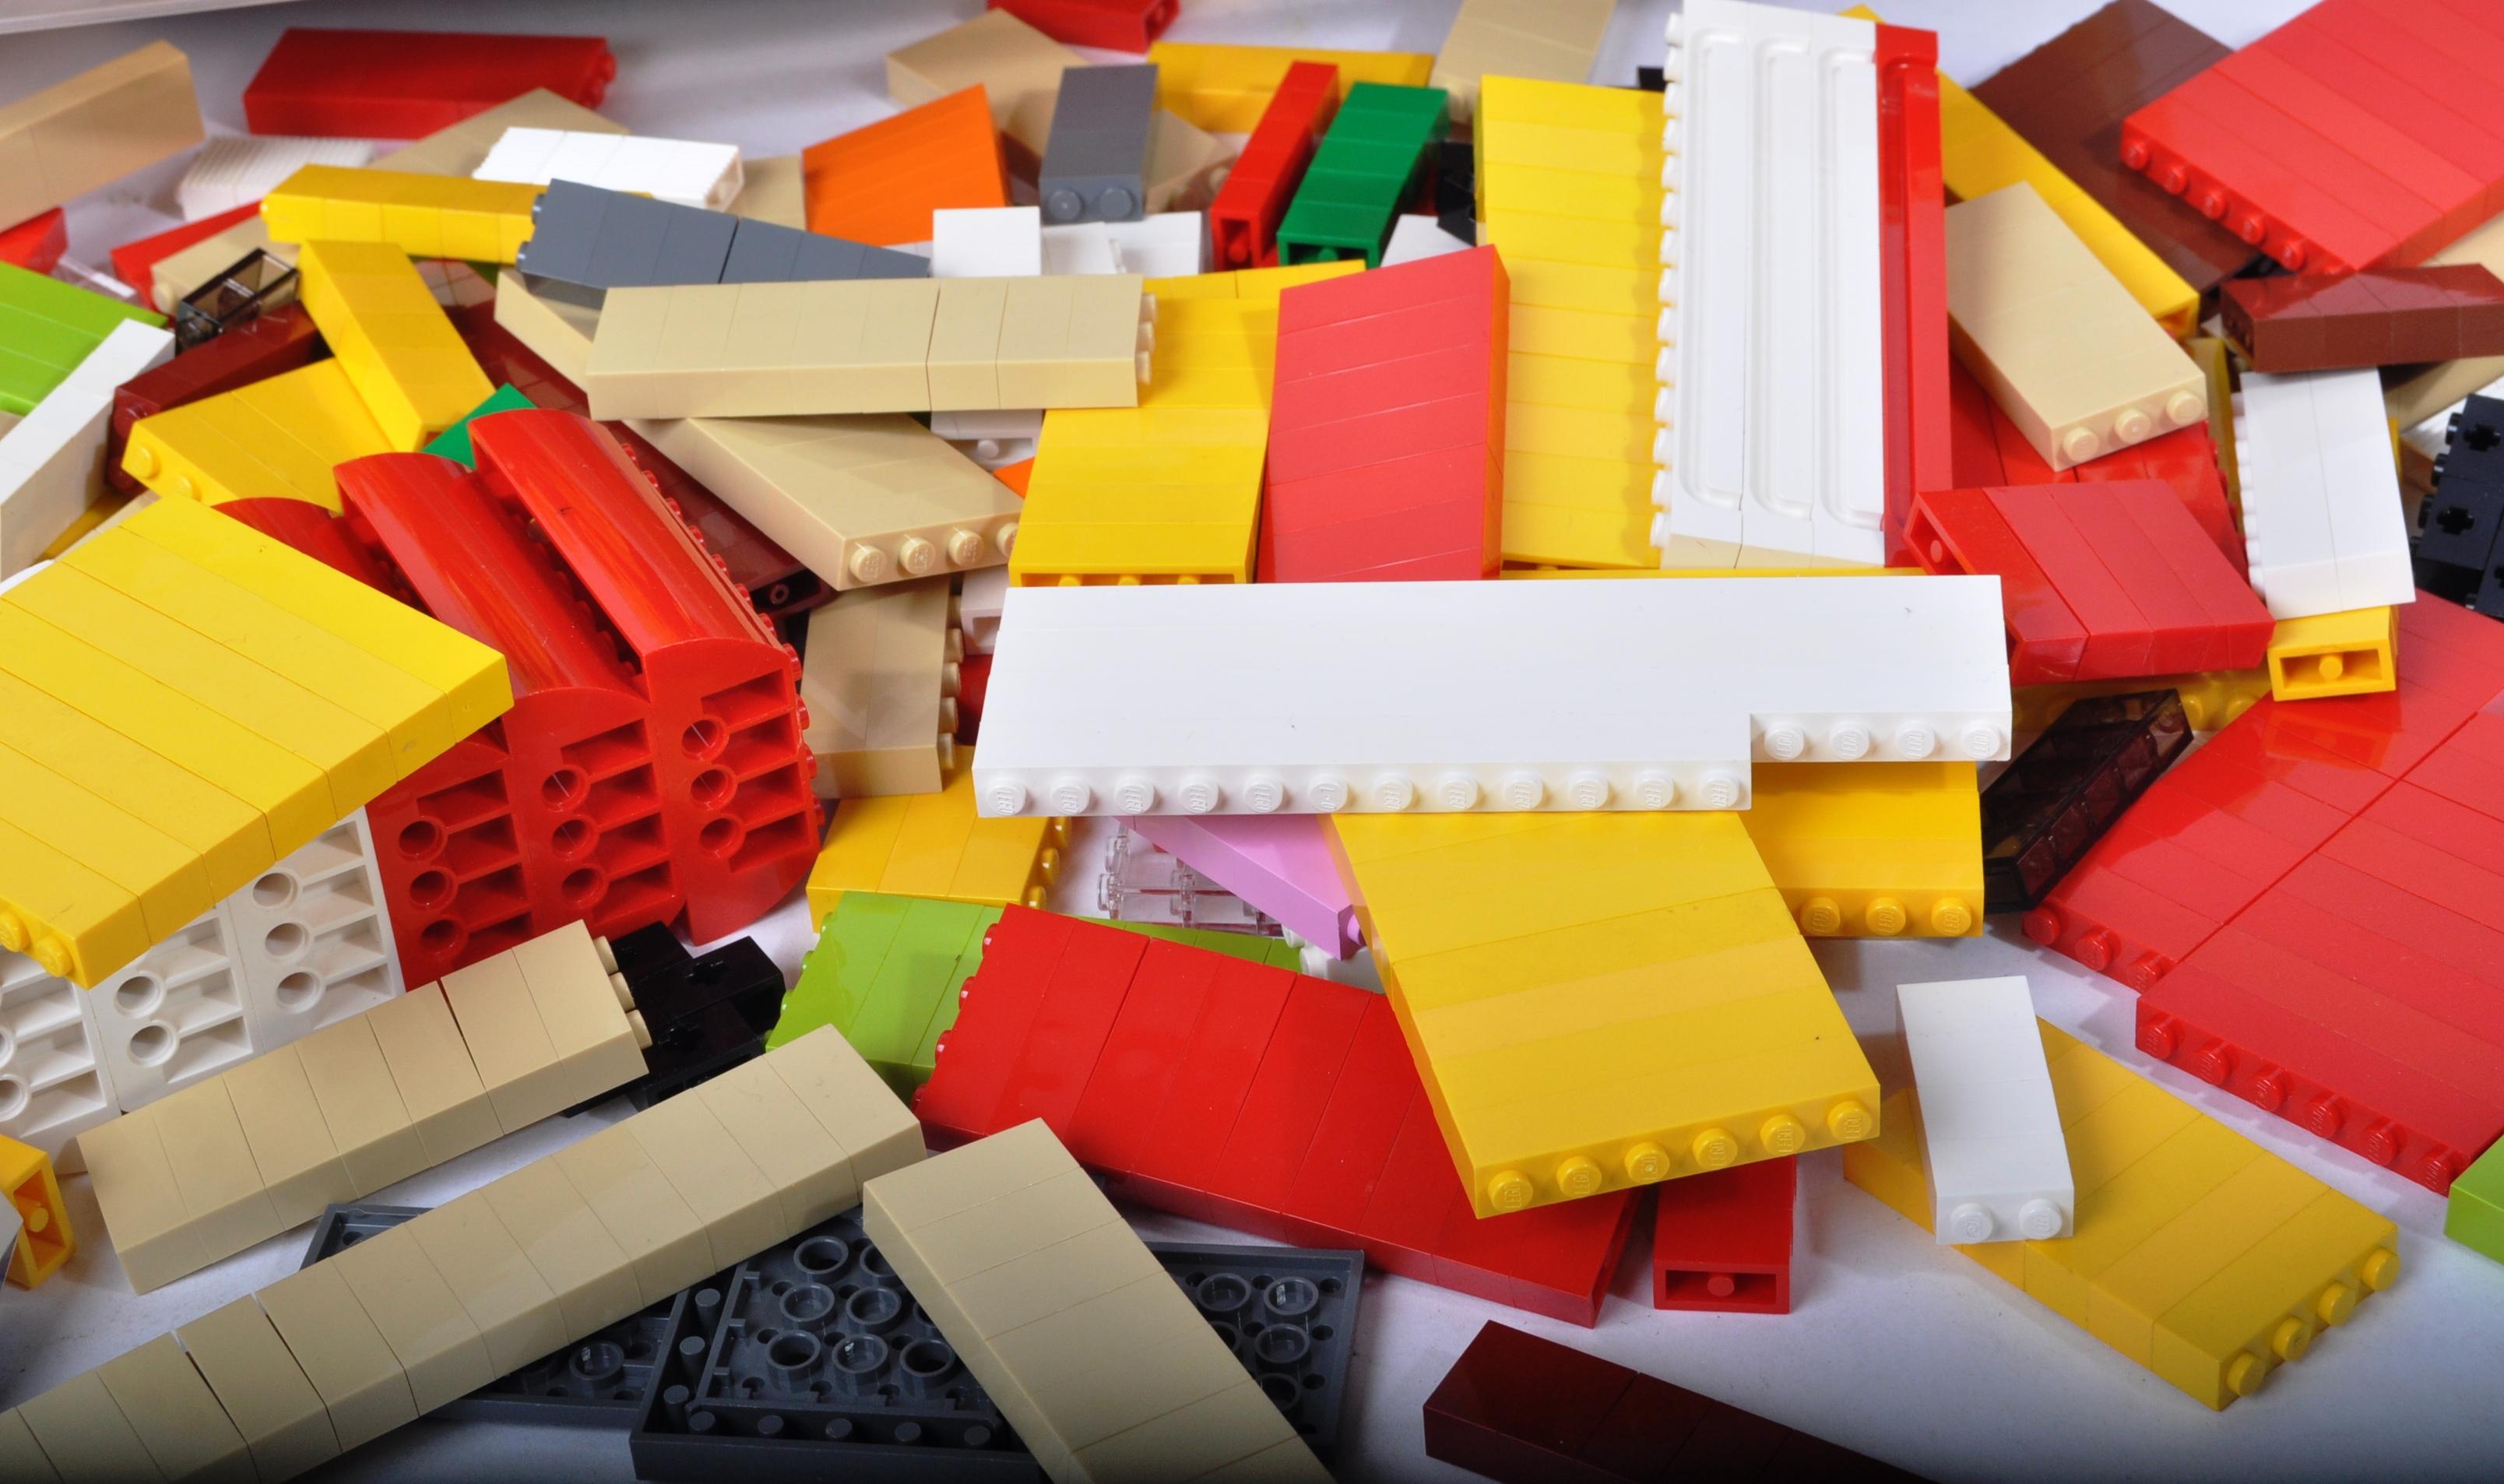 LARGE QUANTITY OF ASSORTED LOOSE LEGO BRICKS - Image 5 of 5